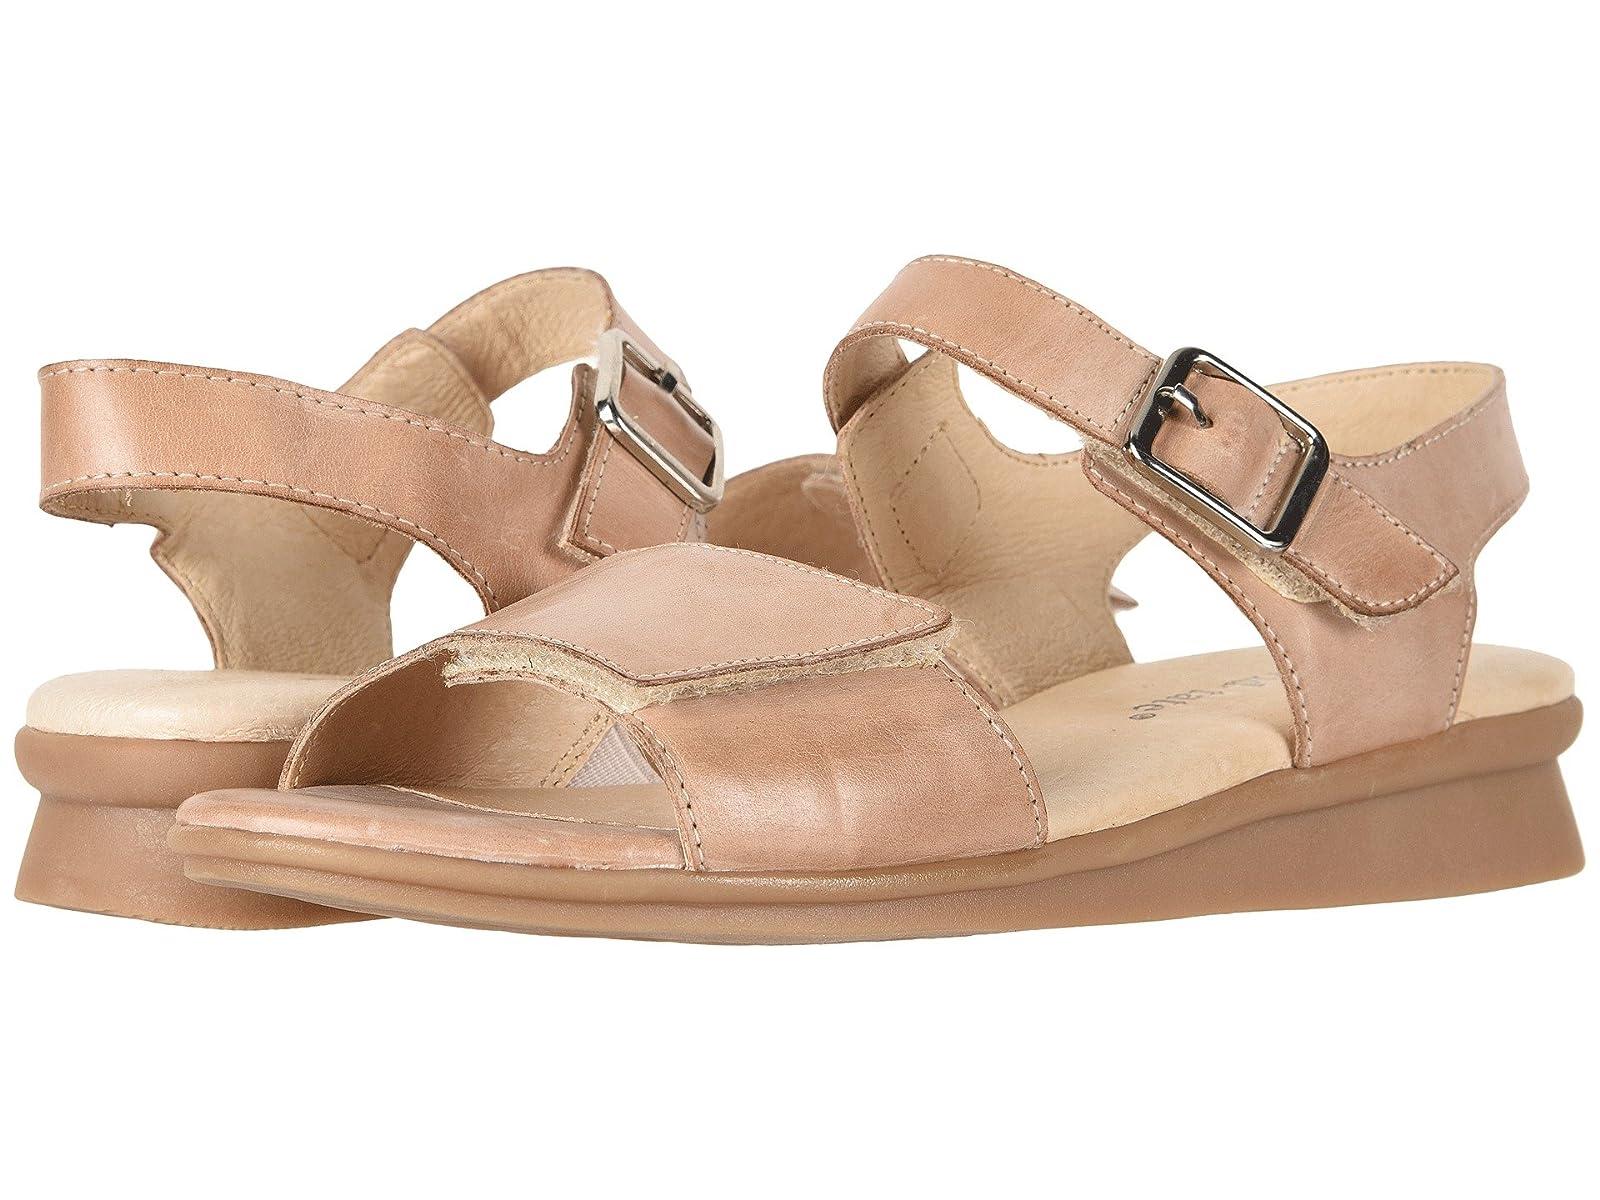 David Tate LightComfortable and distinctive shoes